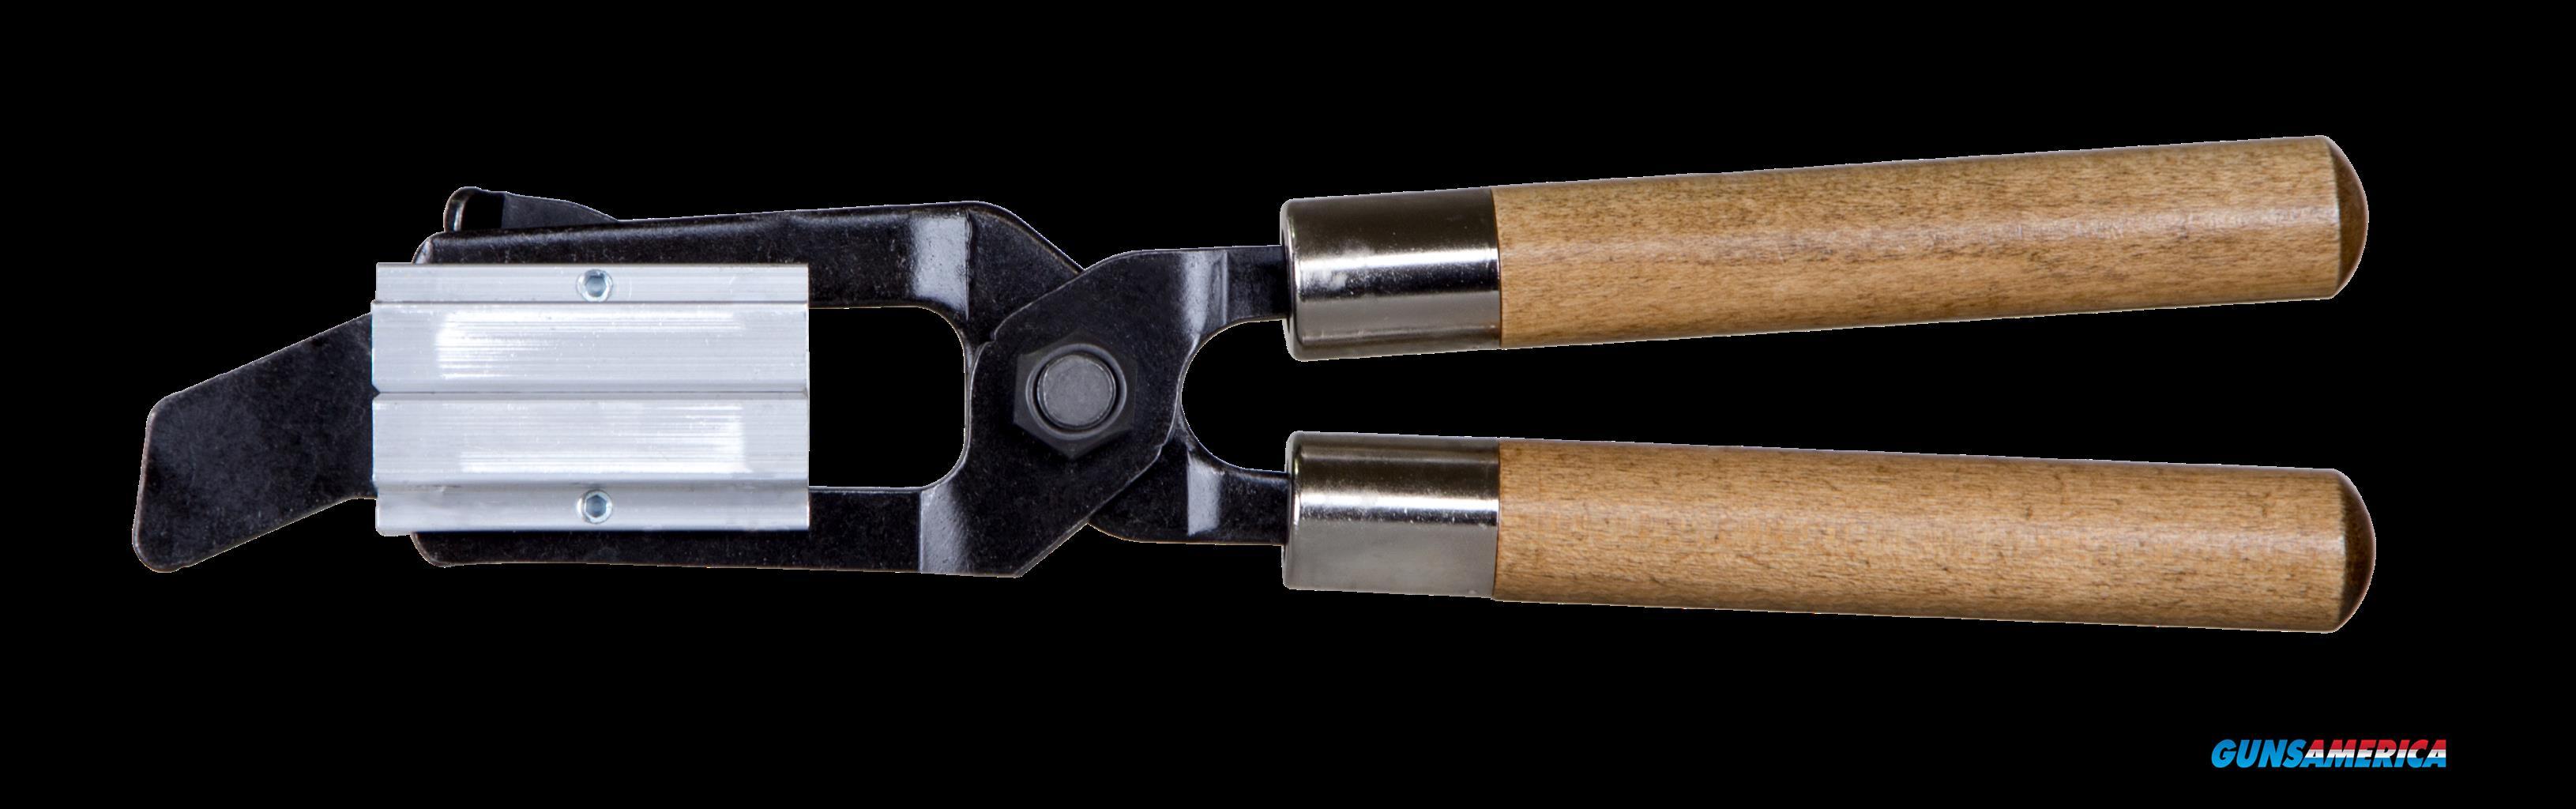 Lee Mold, Lee 90420 Mold D C 375 Ball  Guns > Pistols > 1911 Pistol Copies (non-Colt)